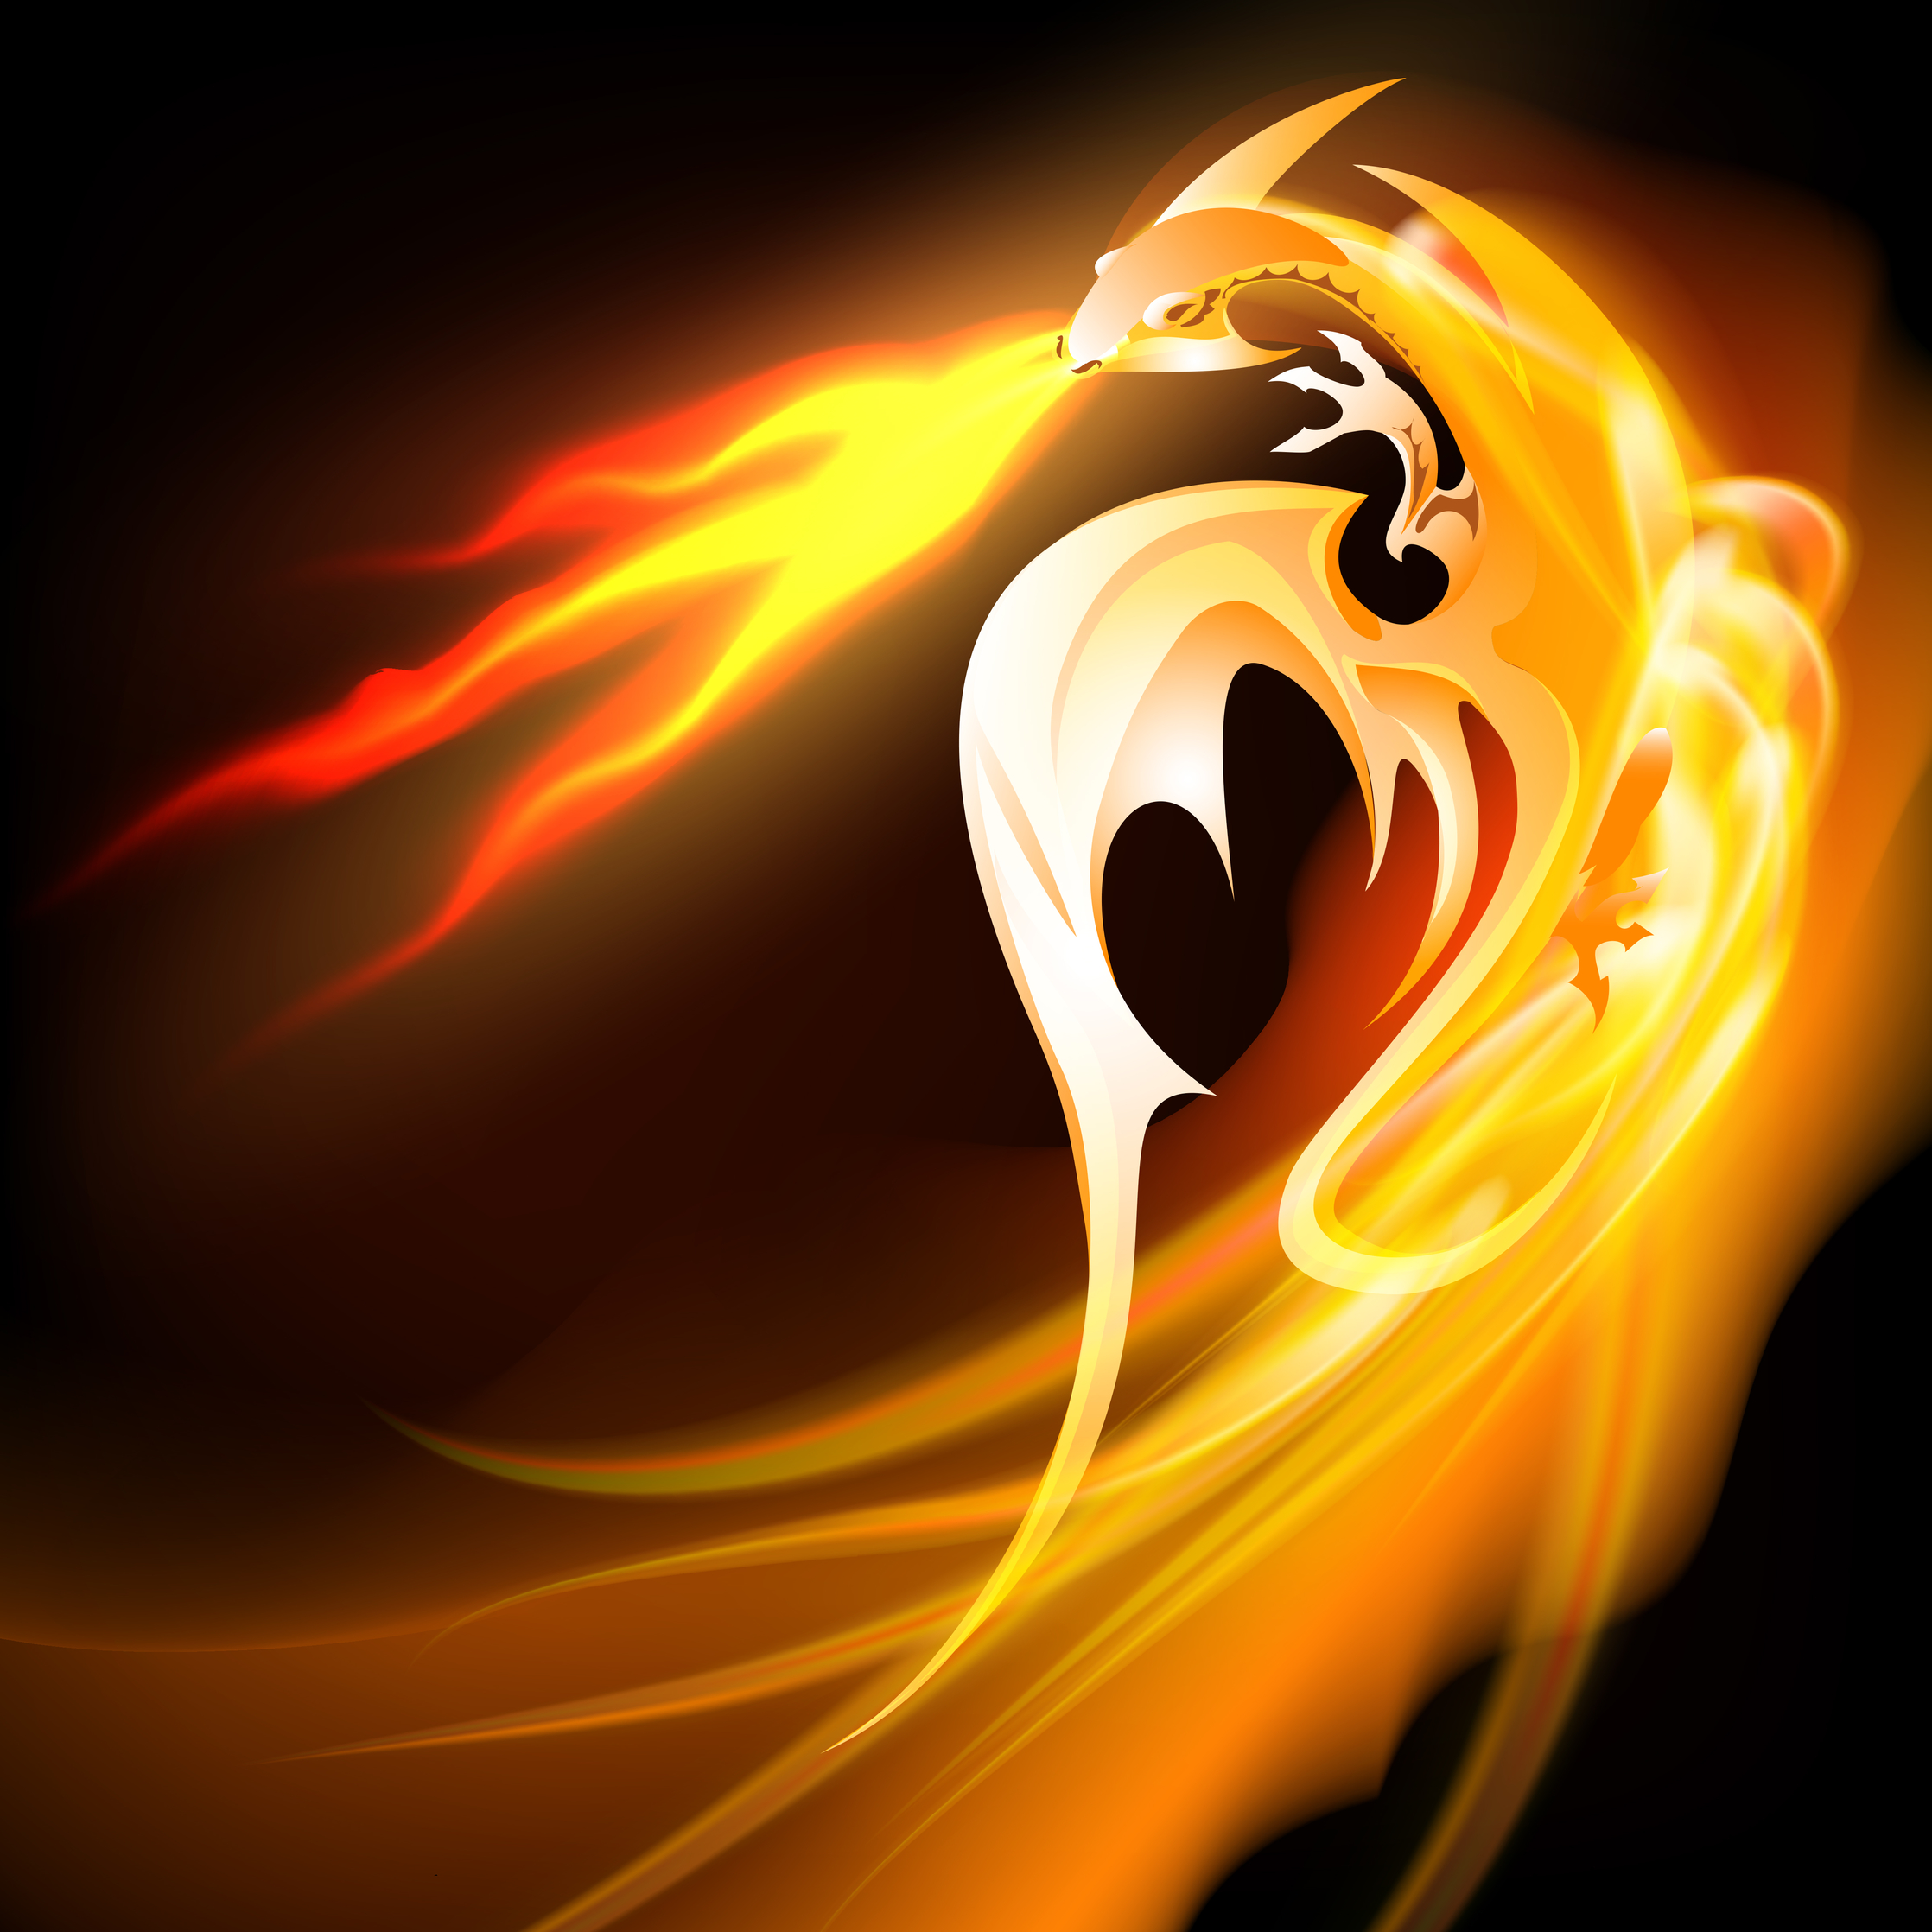 Fire Dragon 2